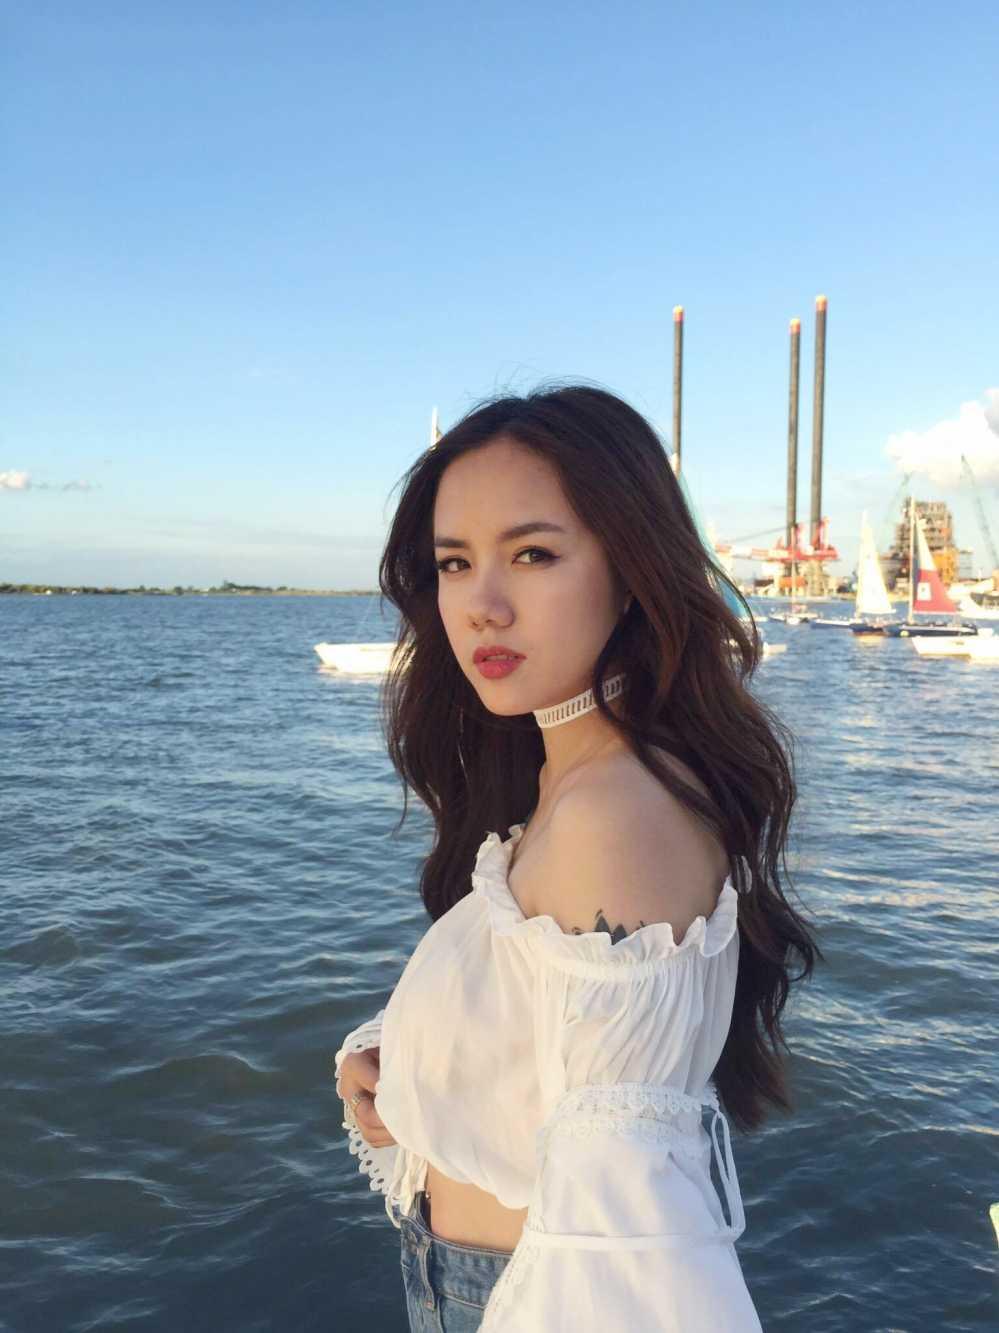 Em gai Phuong Linh khoe 'nguoi yeu' trong san pham dau tay hinh anh 7